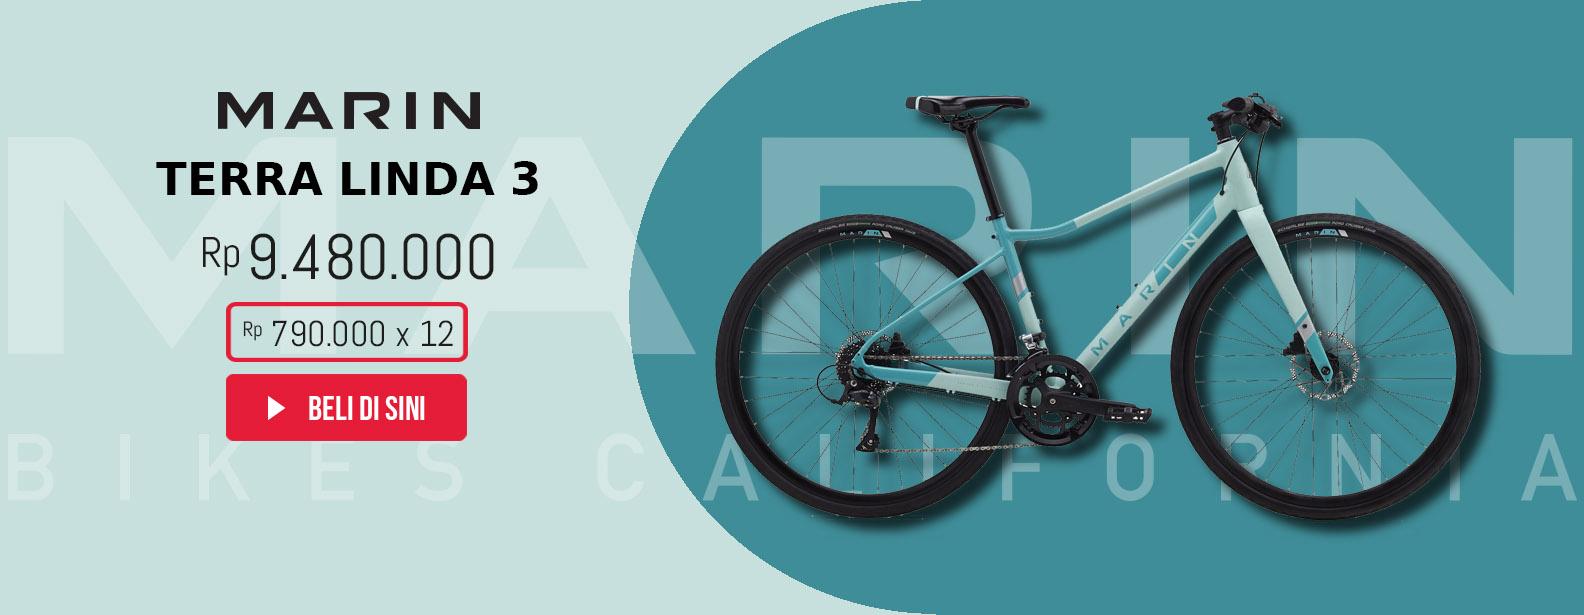 Marin Sepeda Terra Linda 3